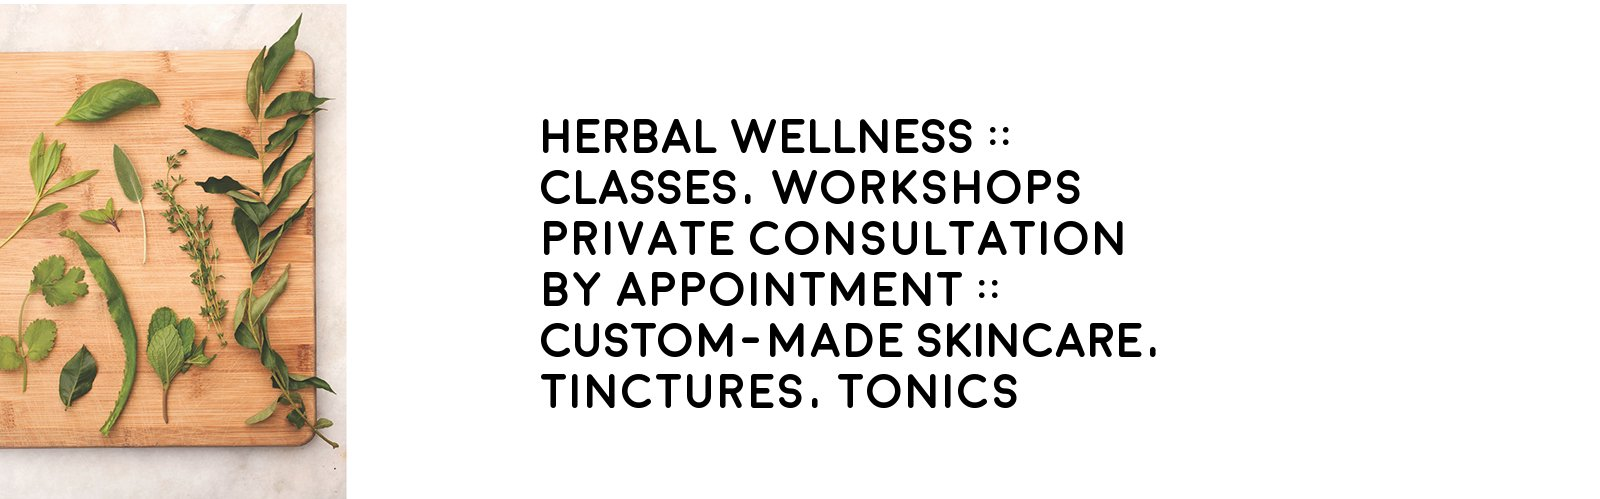 website B herbal wellness.jpg